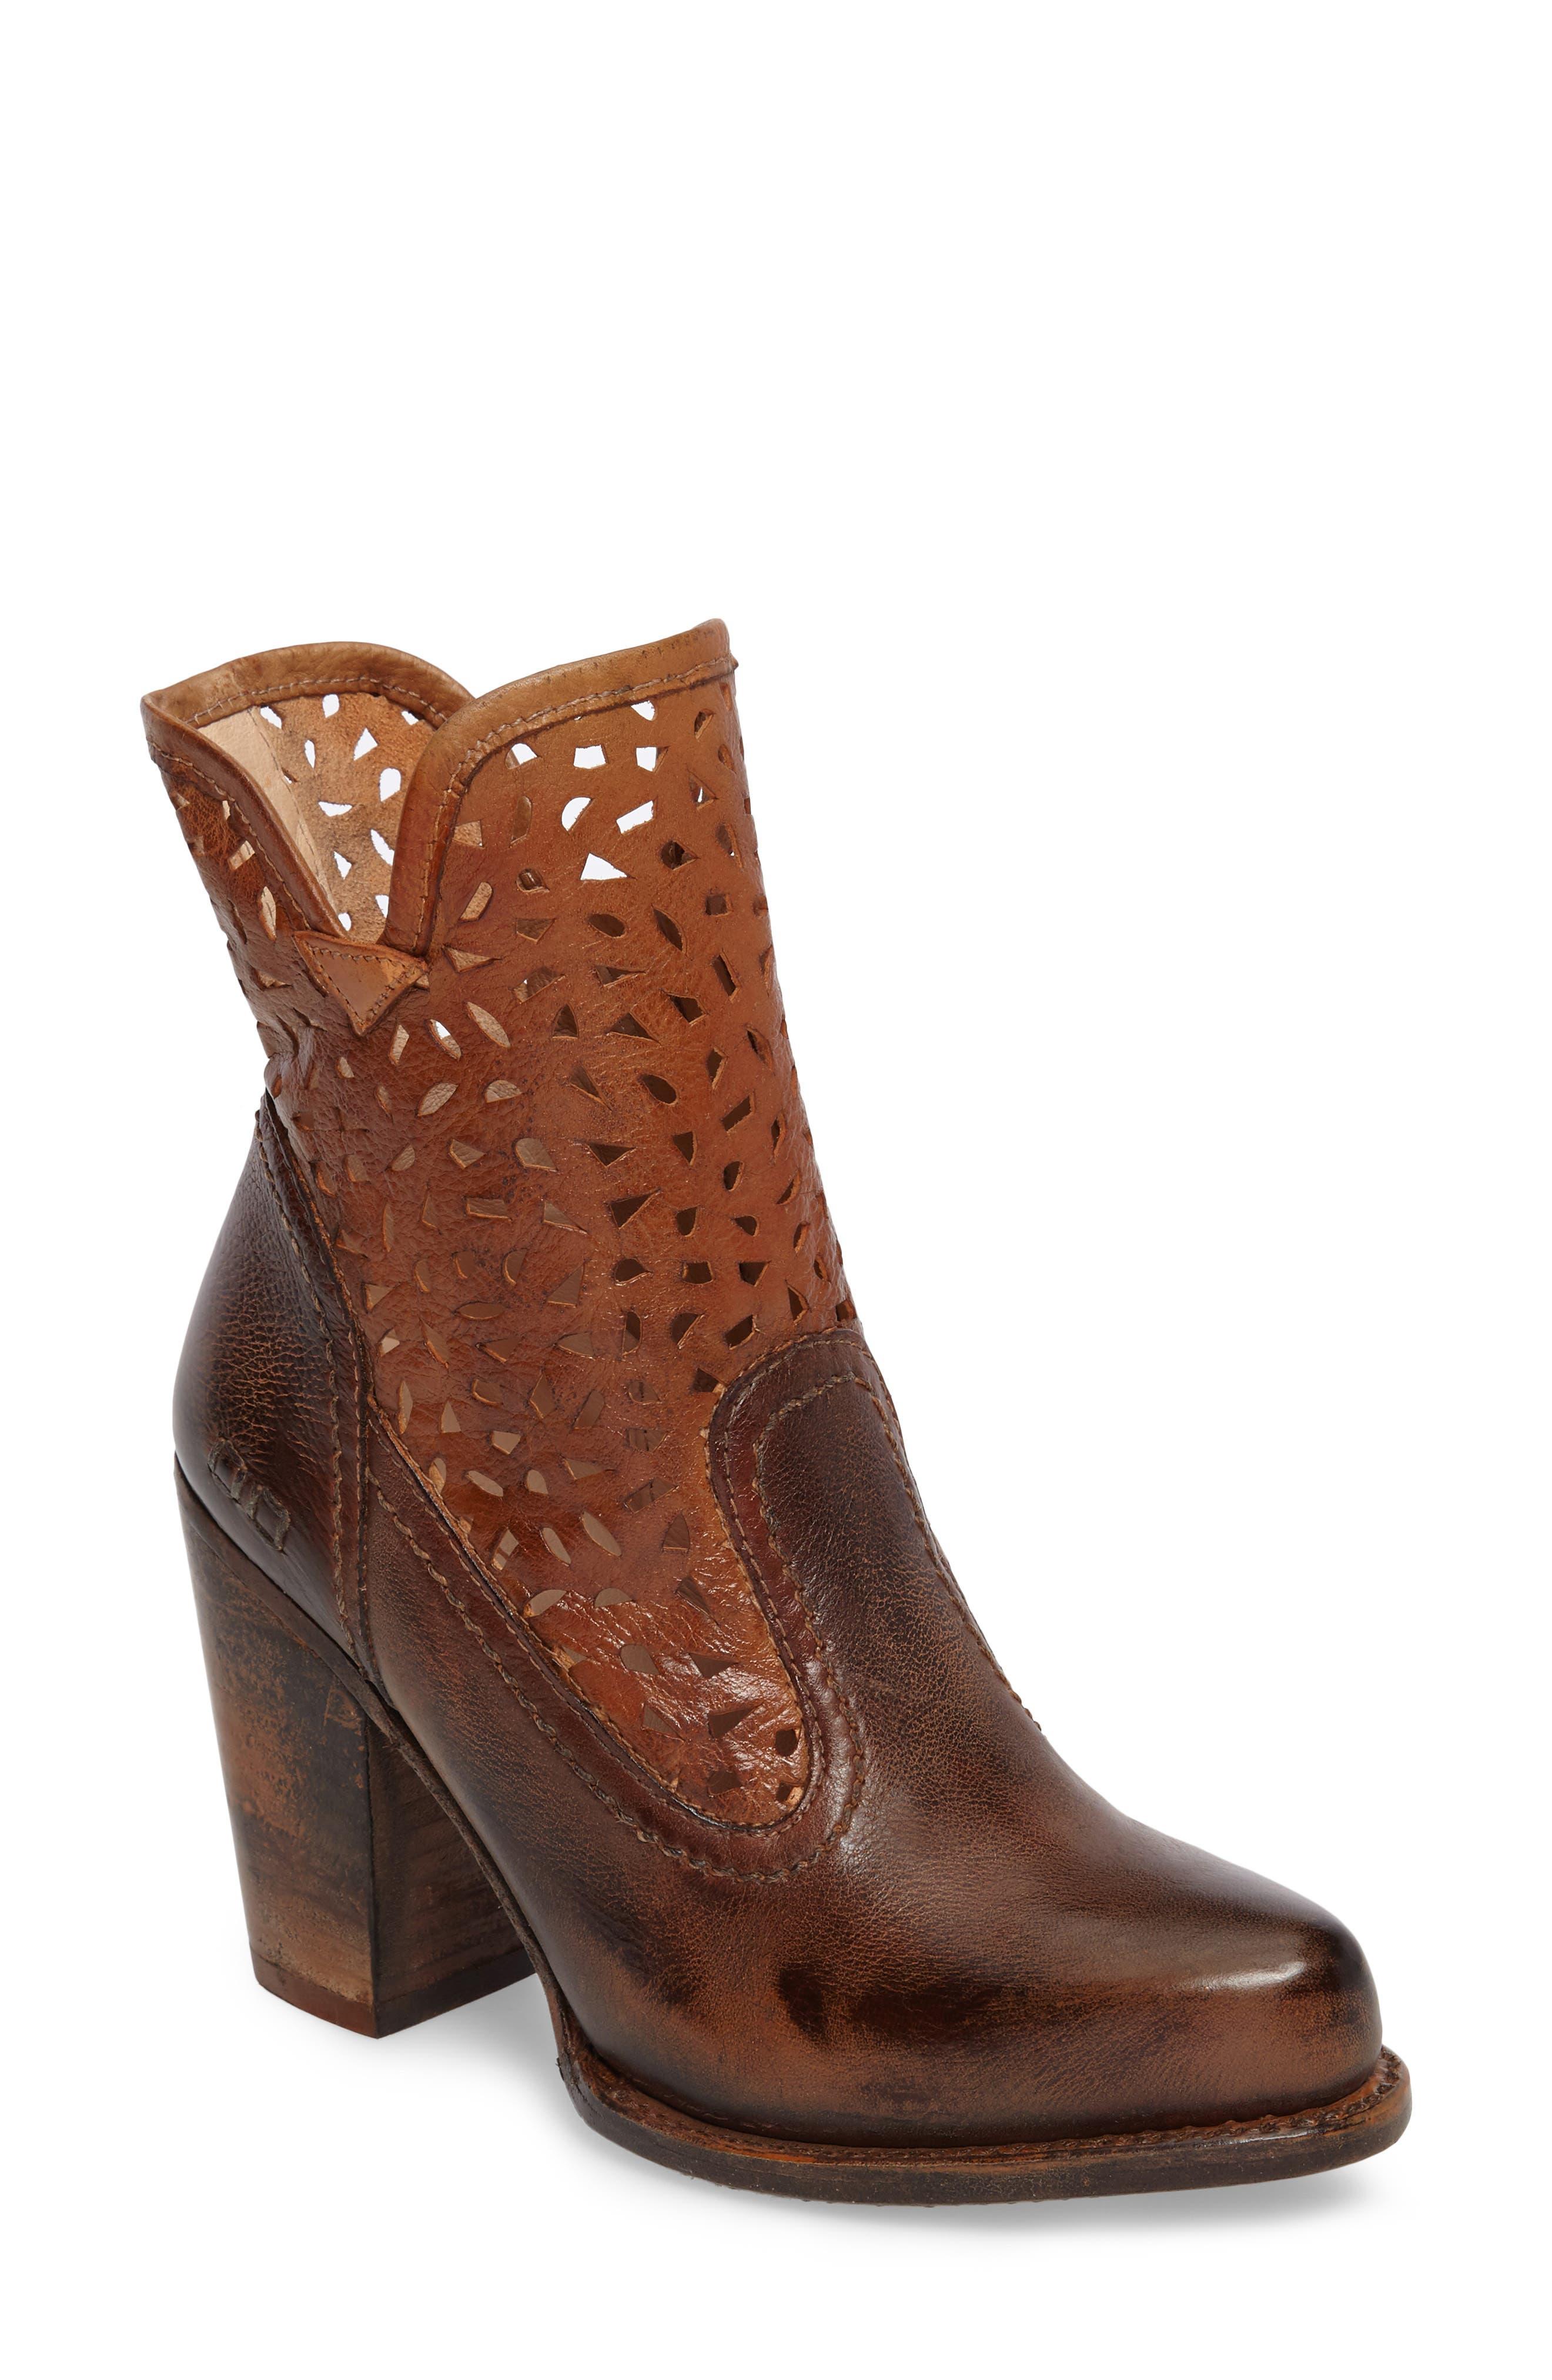 Alternate Image 1 Selected - Bed Stu Irma Perforated Boot (Women)